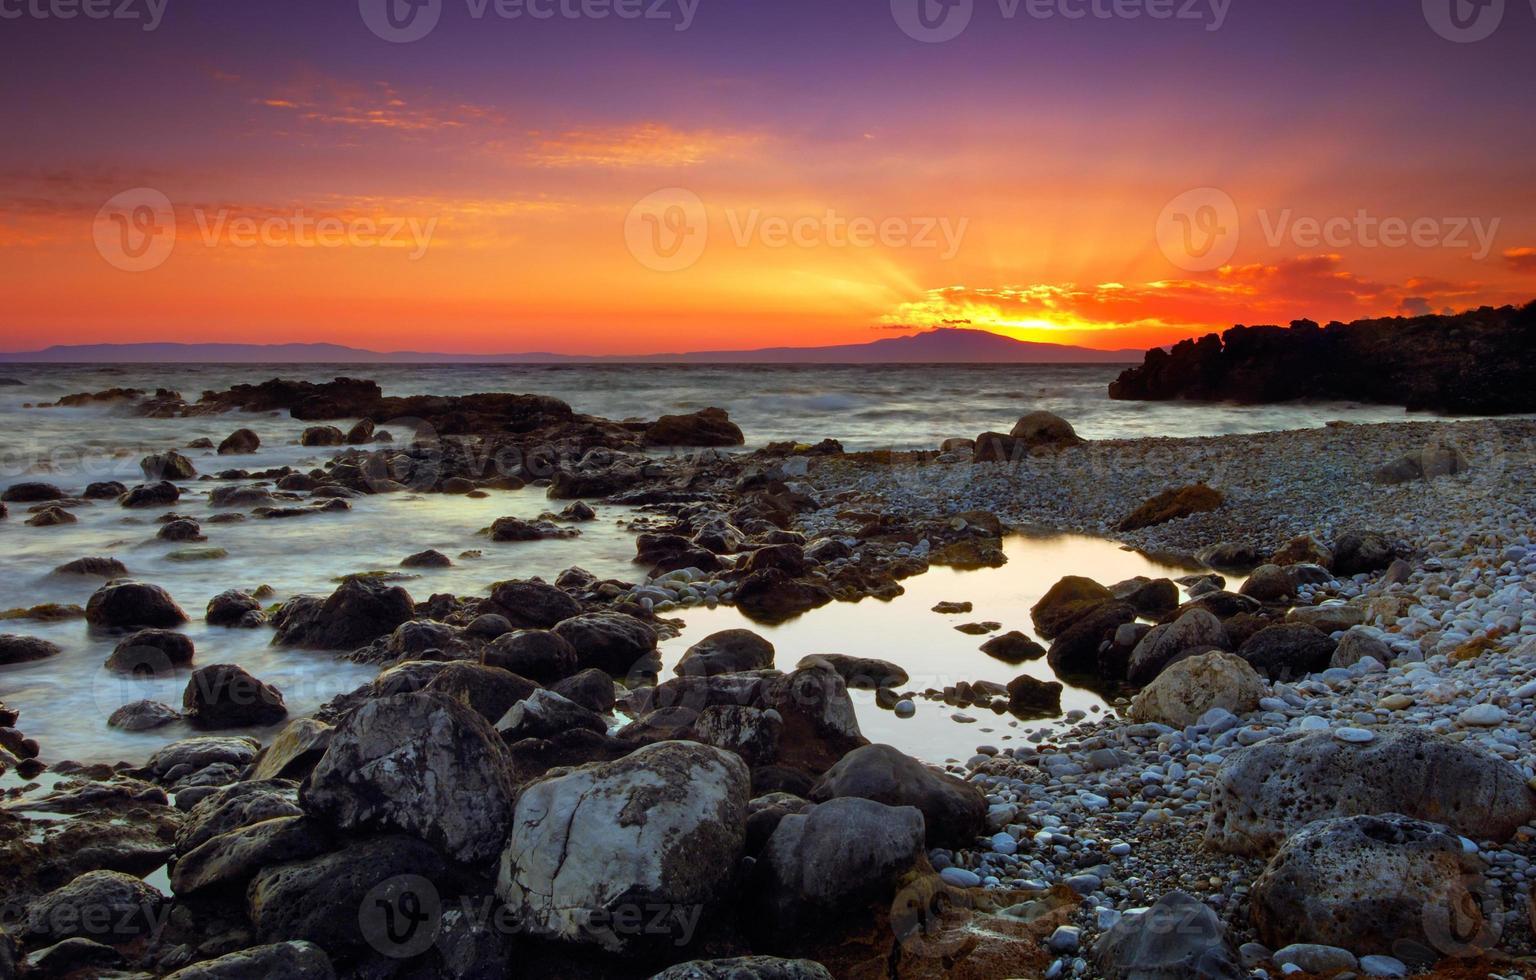 Glorious sunset over rocky sea photo